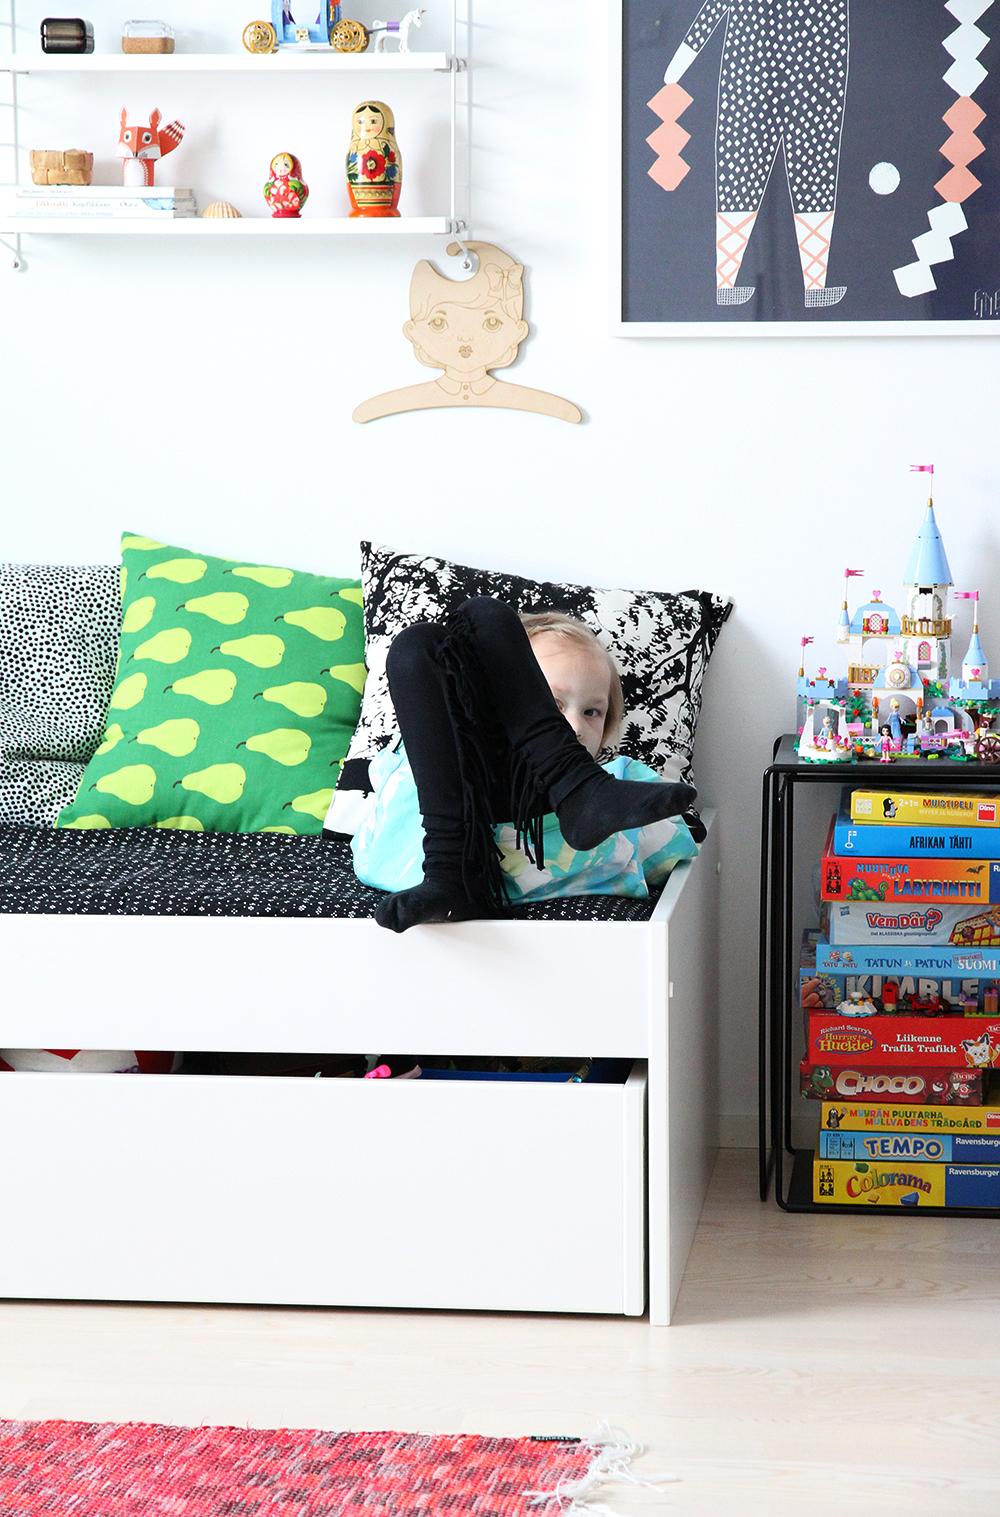 hunajaista siirin huone lastenhuone sisustusblogi avaroom